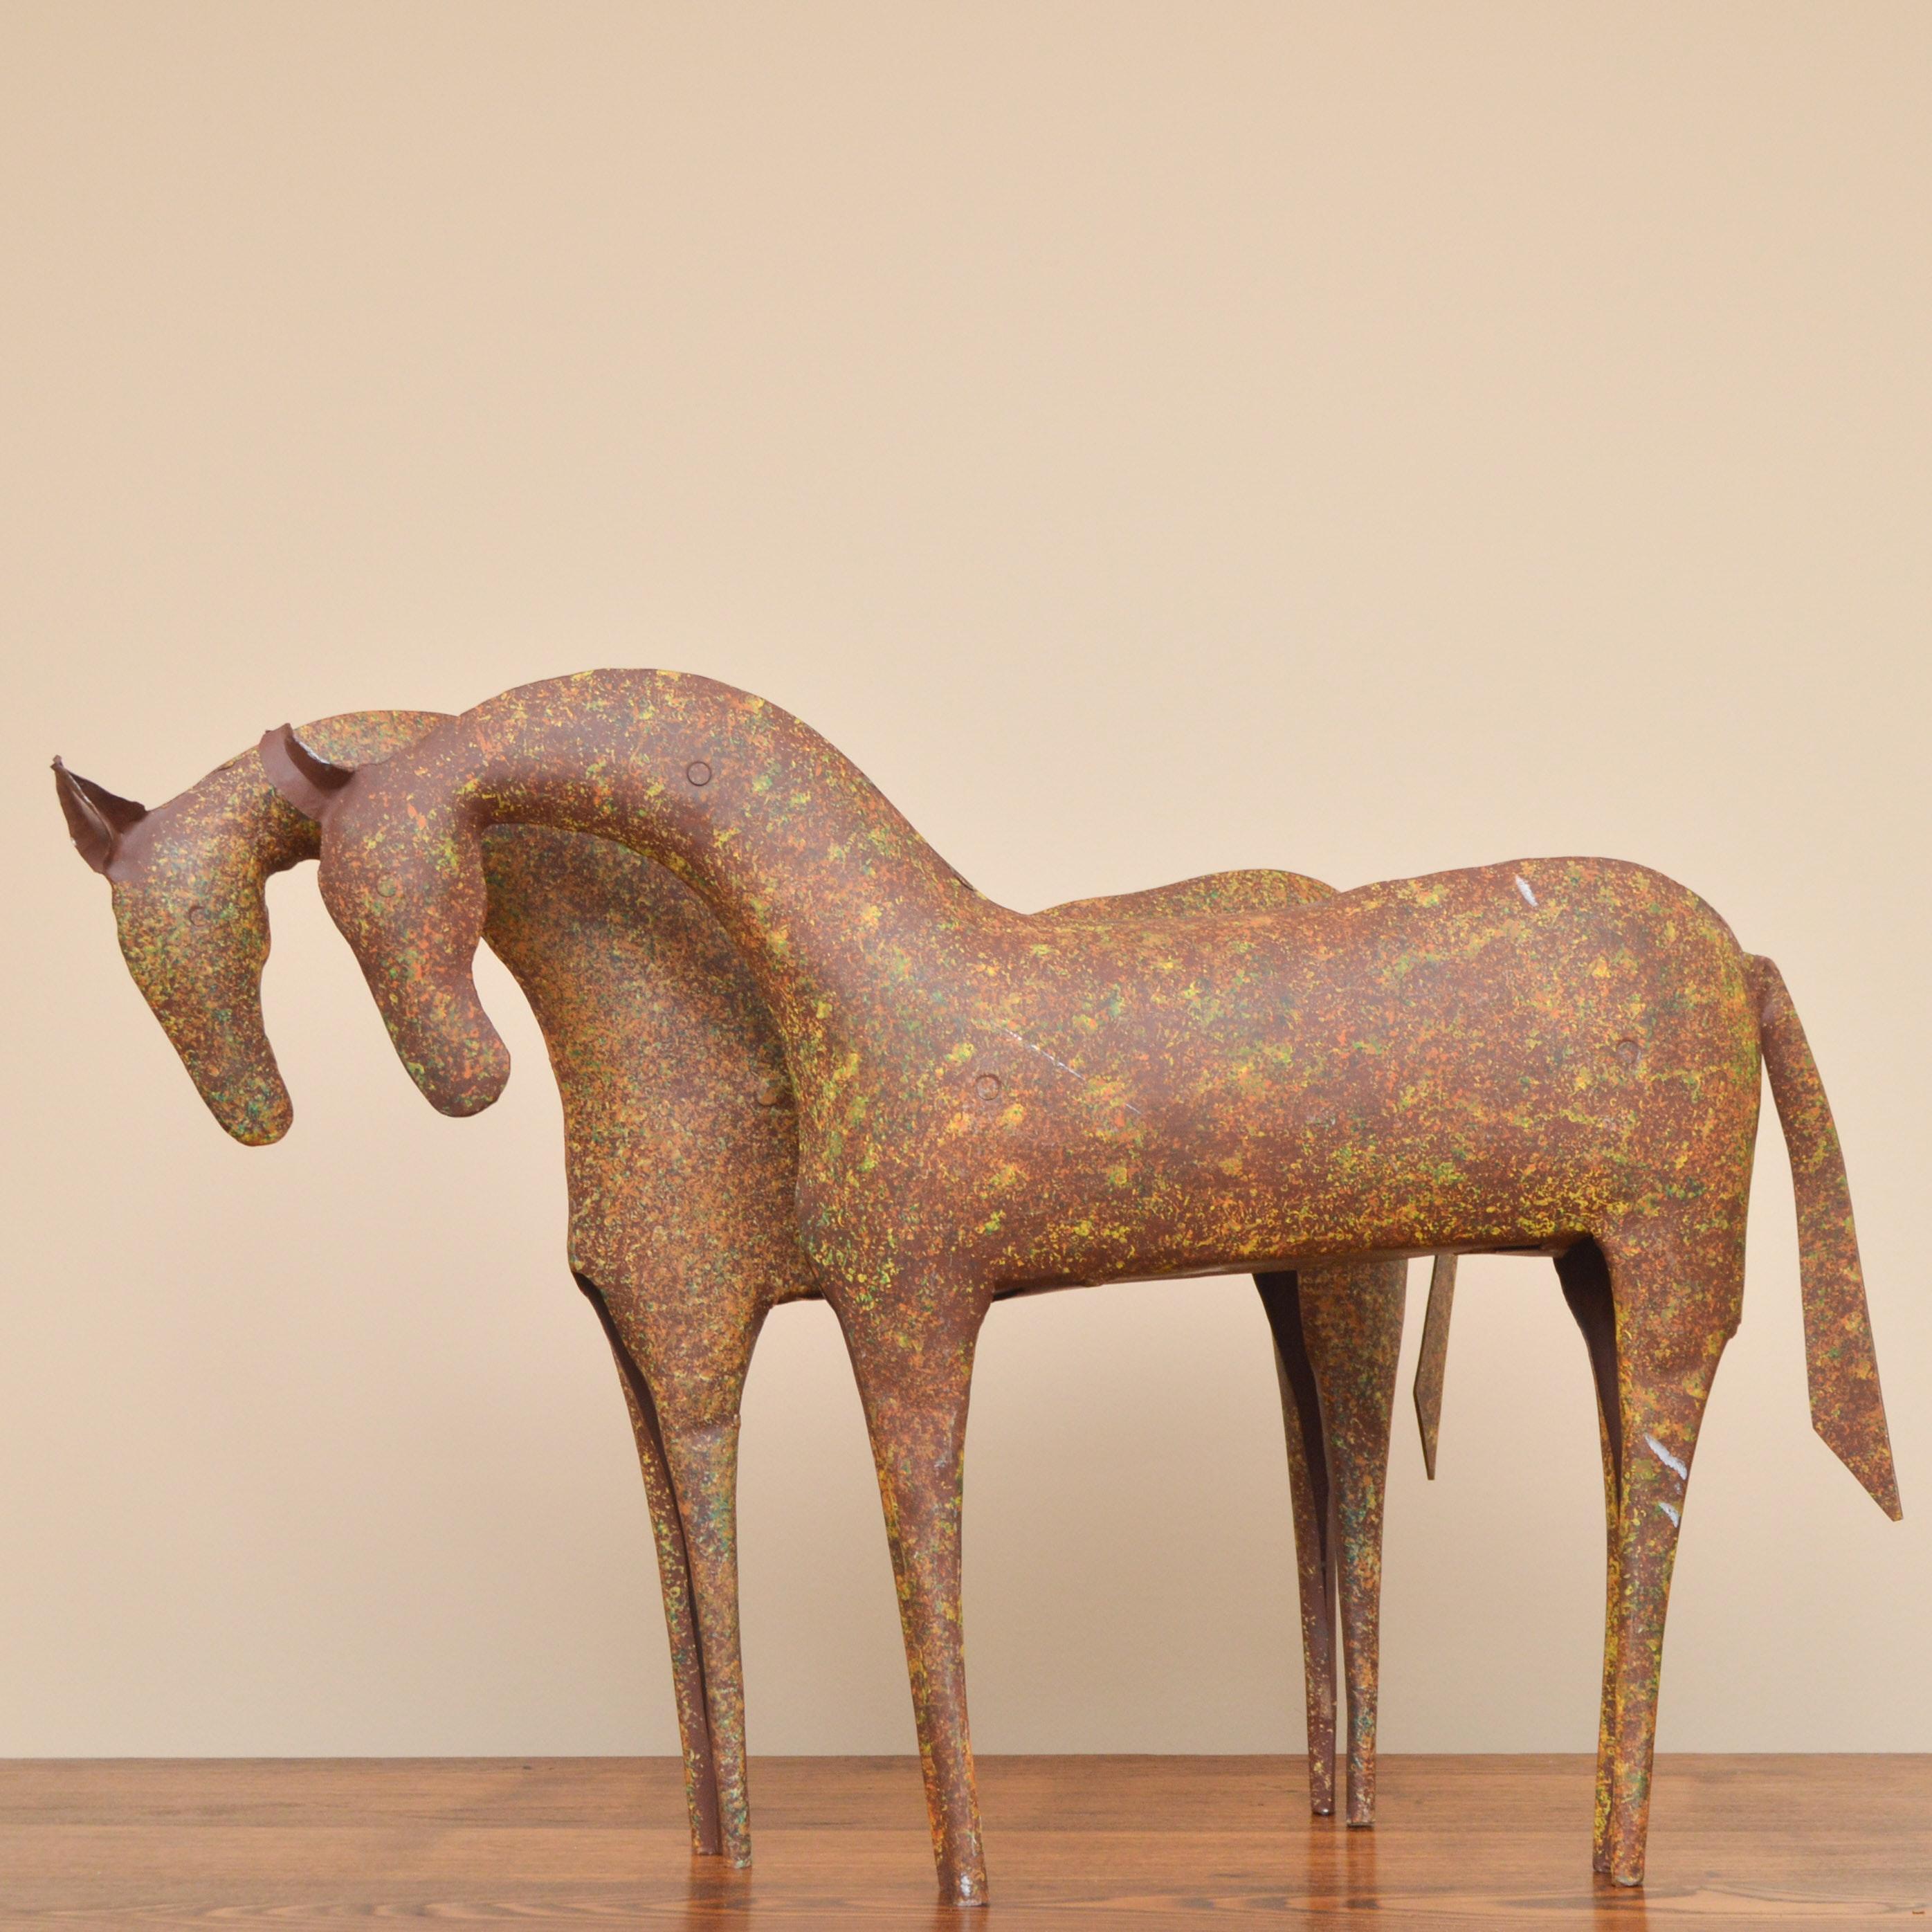 Rustic Metal Horse Statues